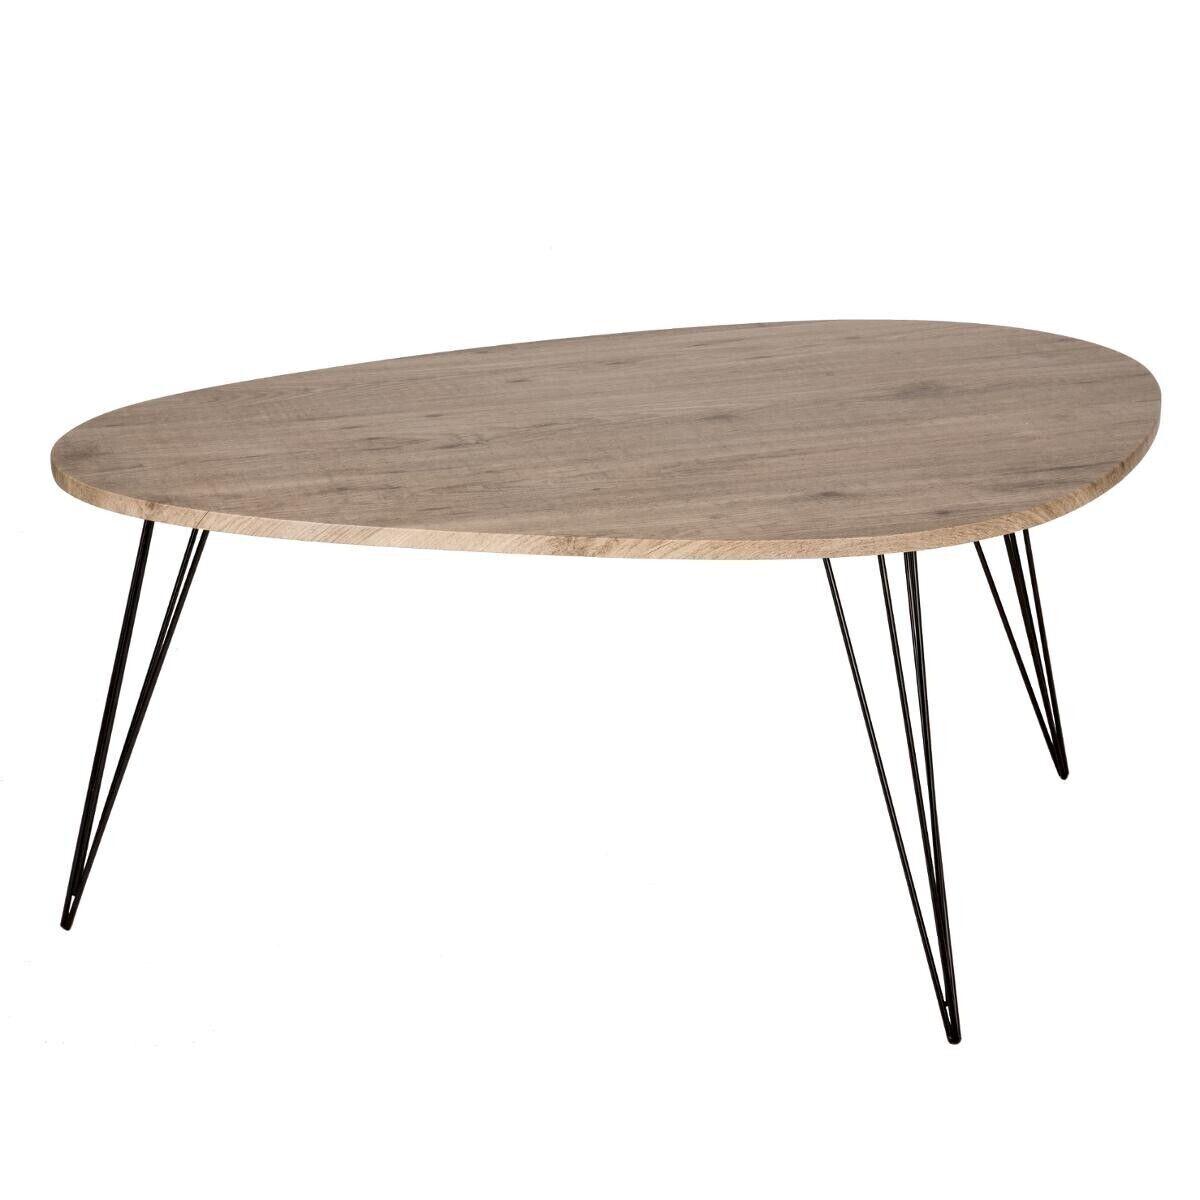 "Atmosphera Table basse ""Neile"" Moyen modèle"